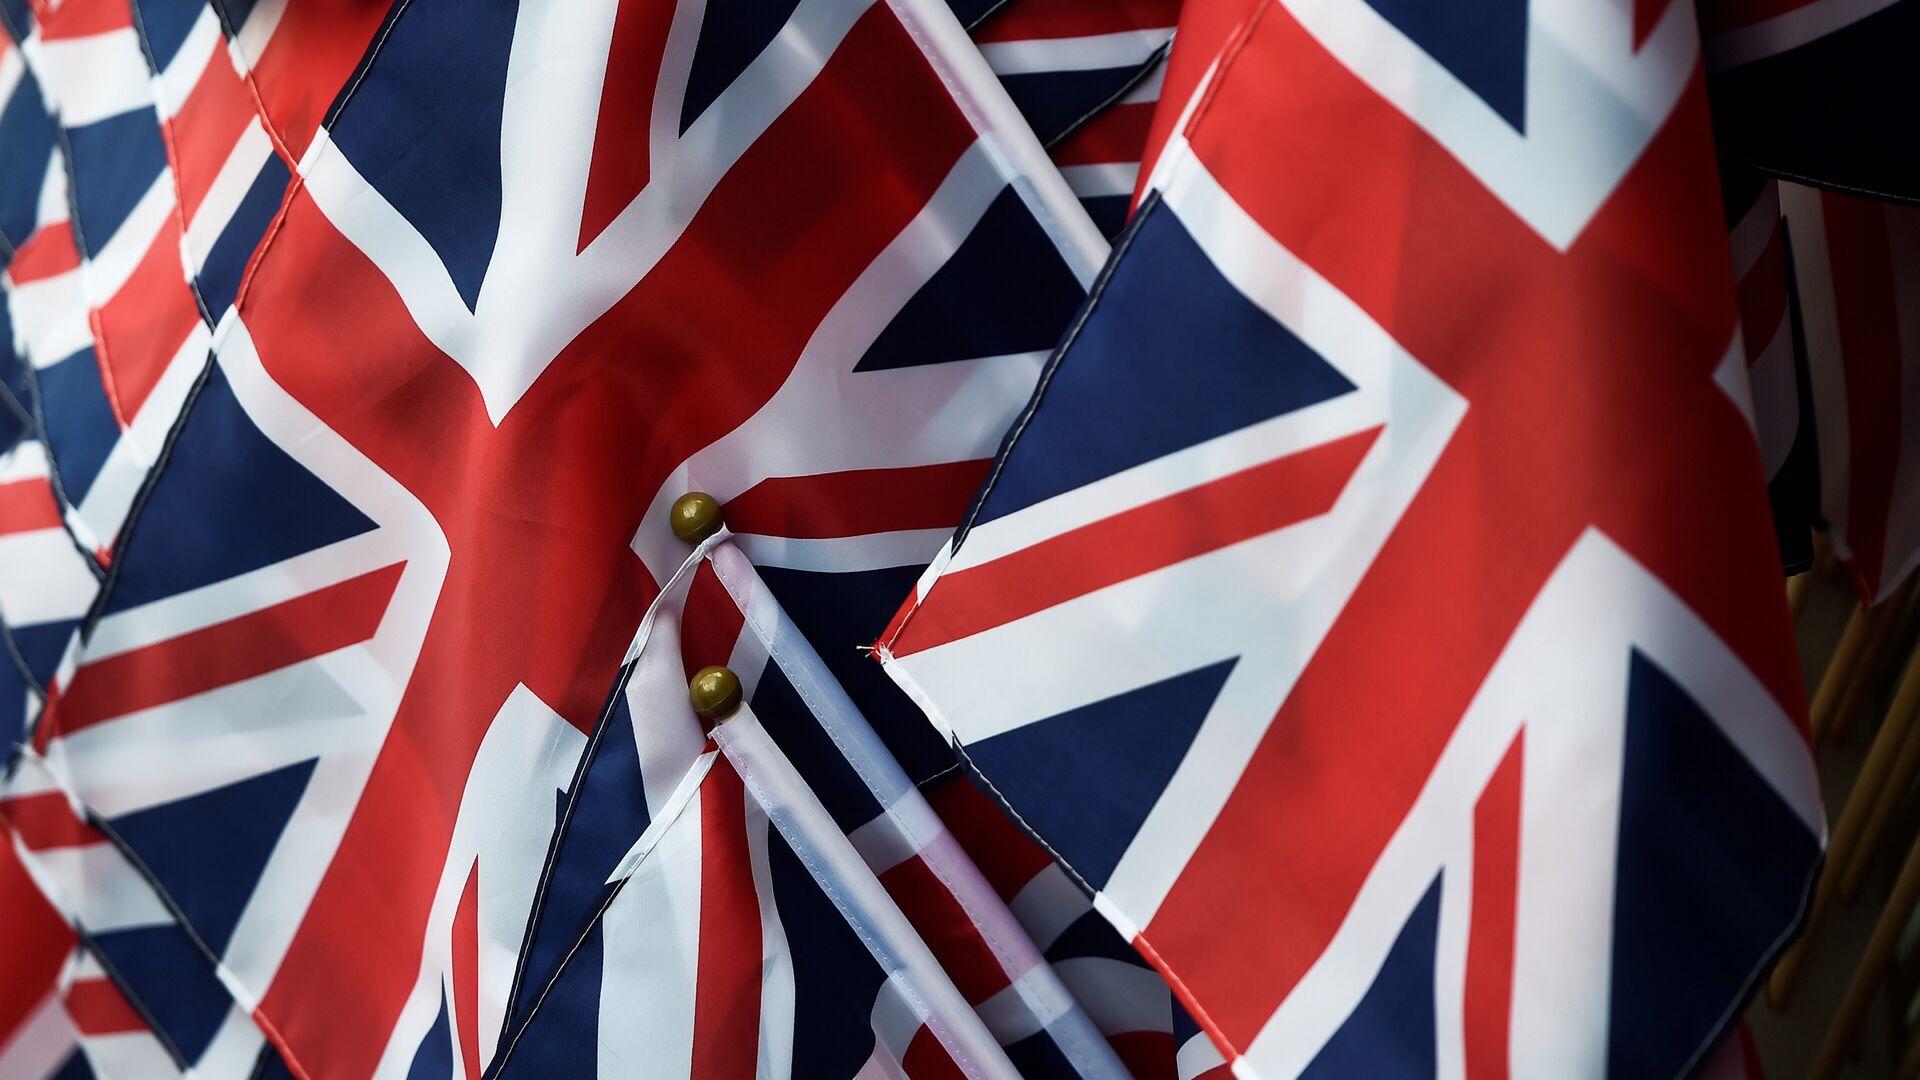 Las banderas del Reino Unido - Sputnik Mundo, 1920, 16.04.2021